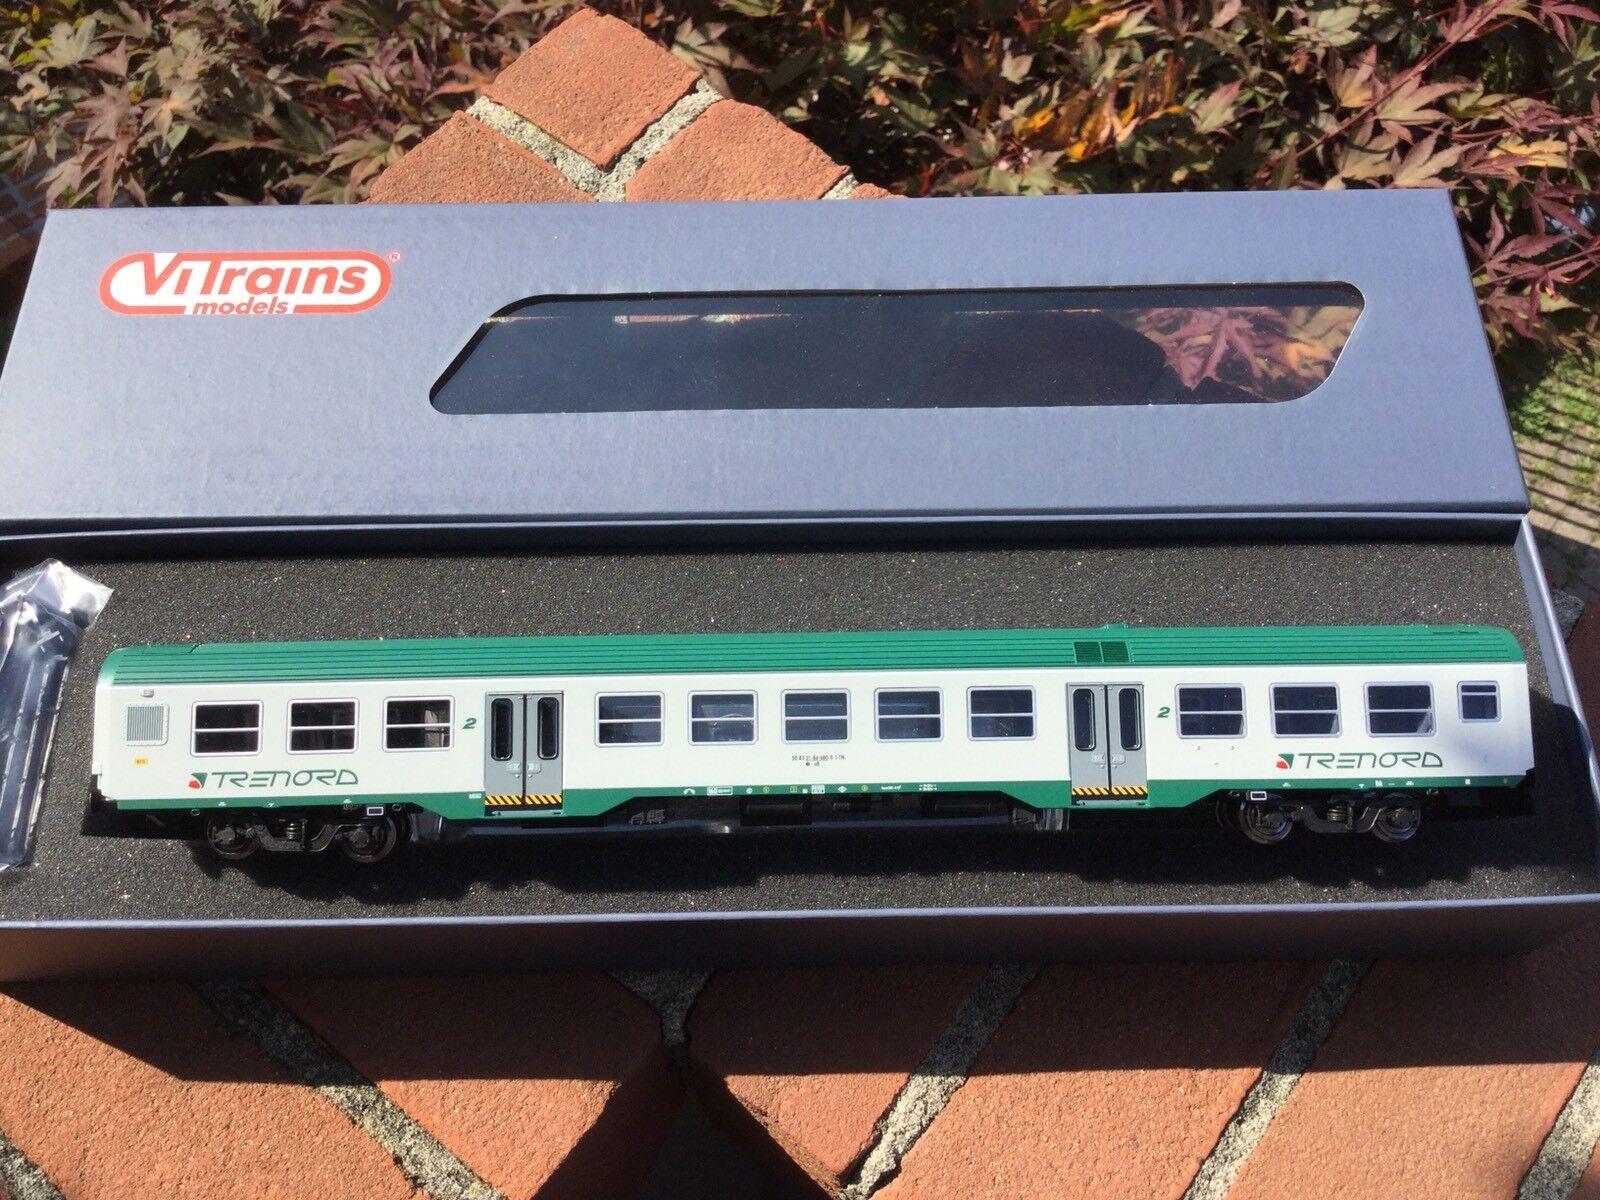 VITRAINS 3104 Carrozza MDVC  livrea TRENORD 2 Classe